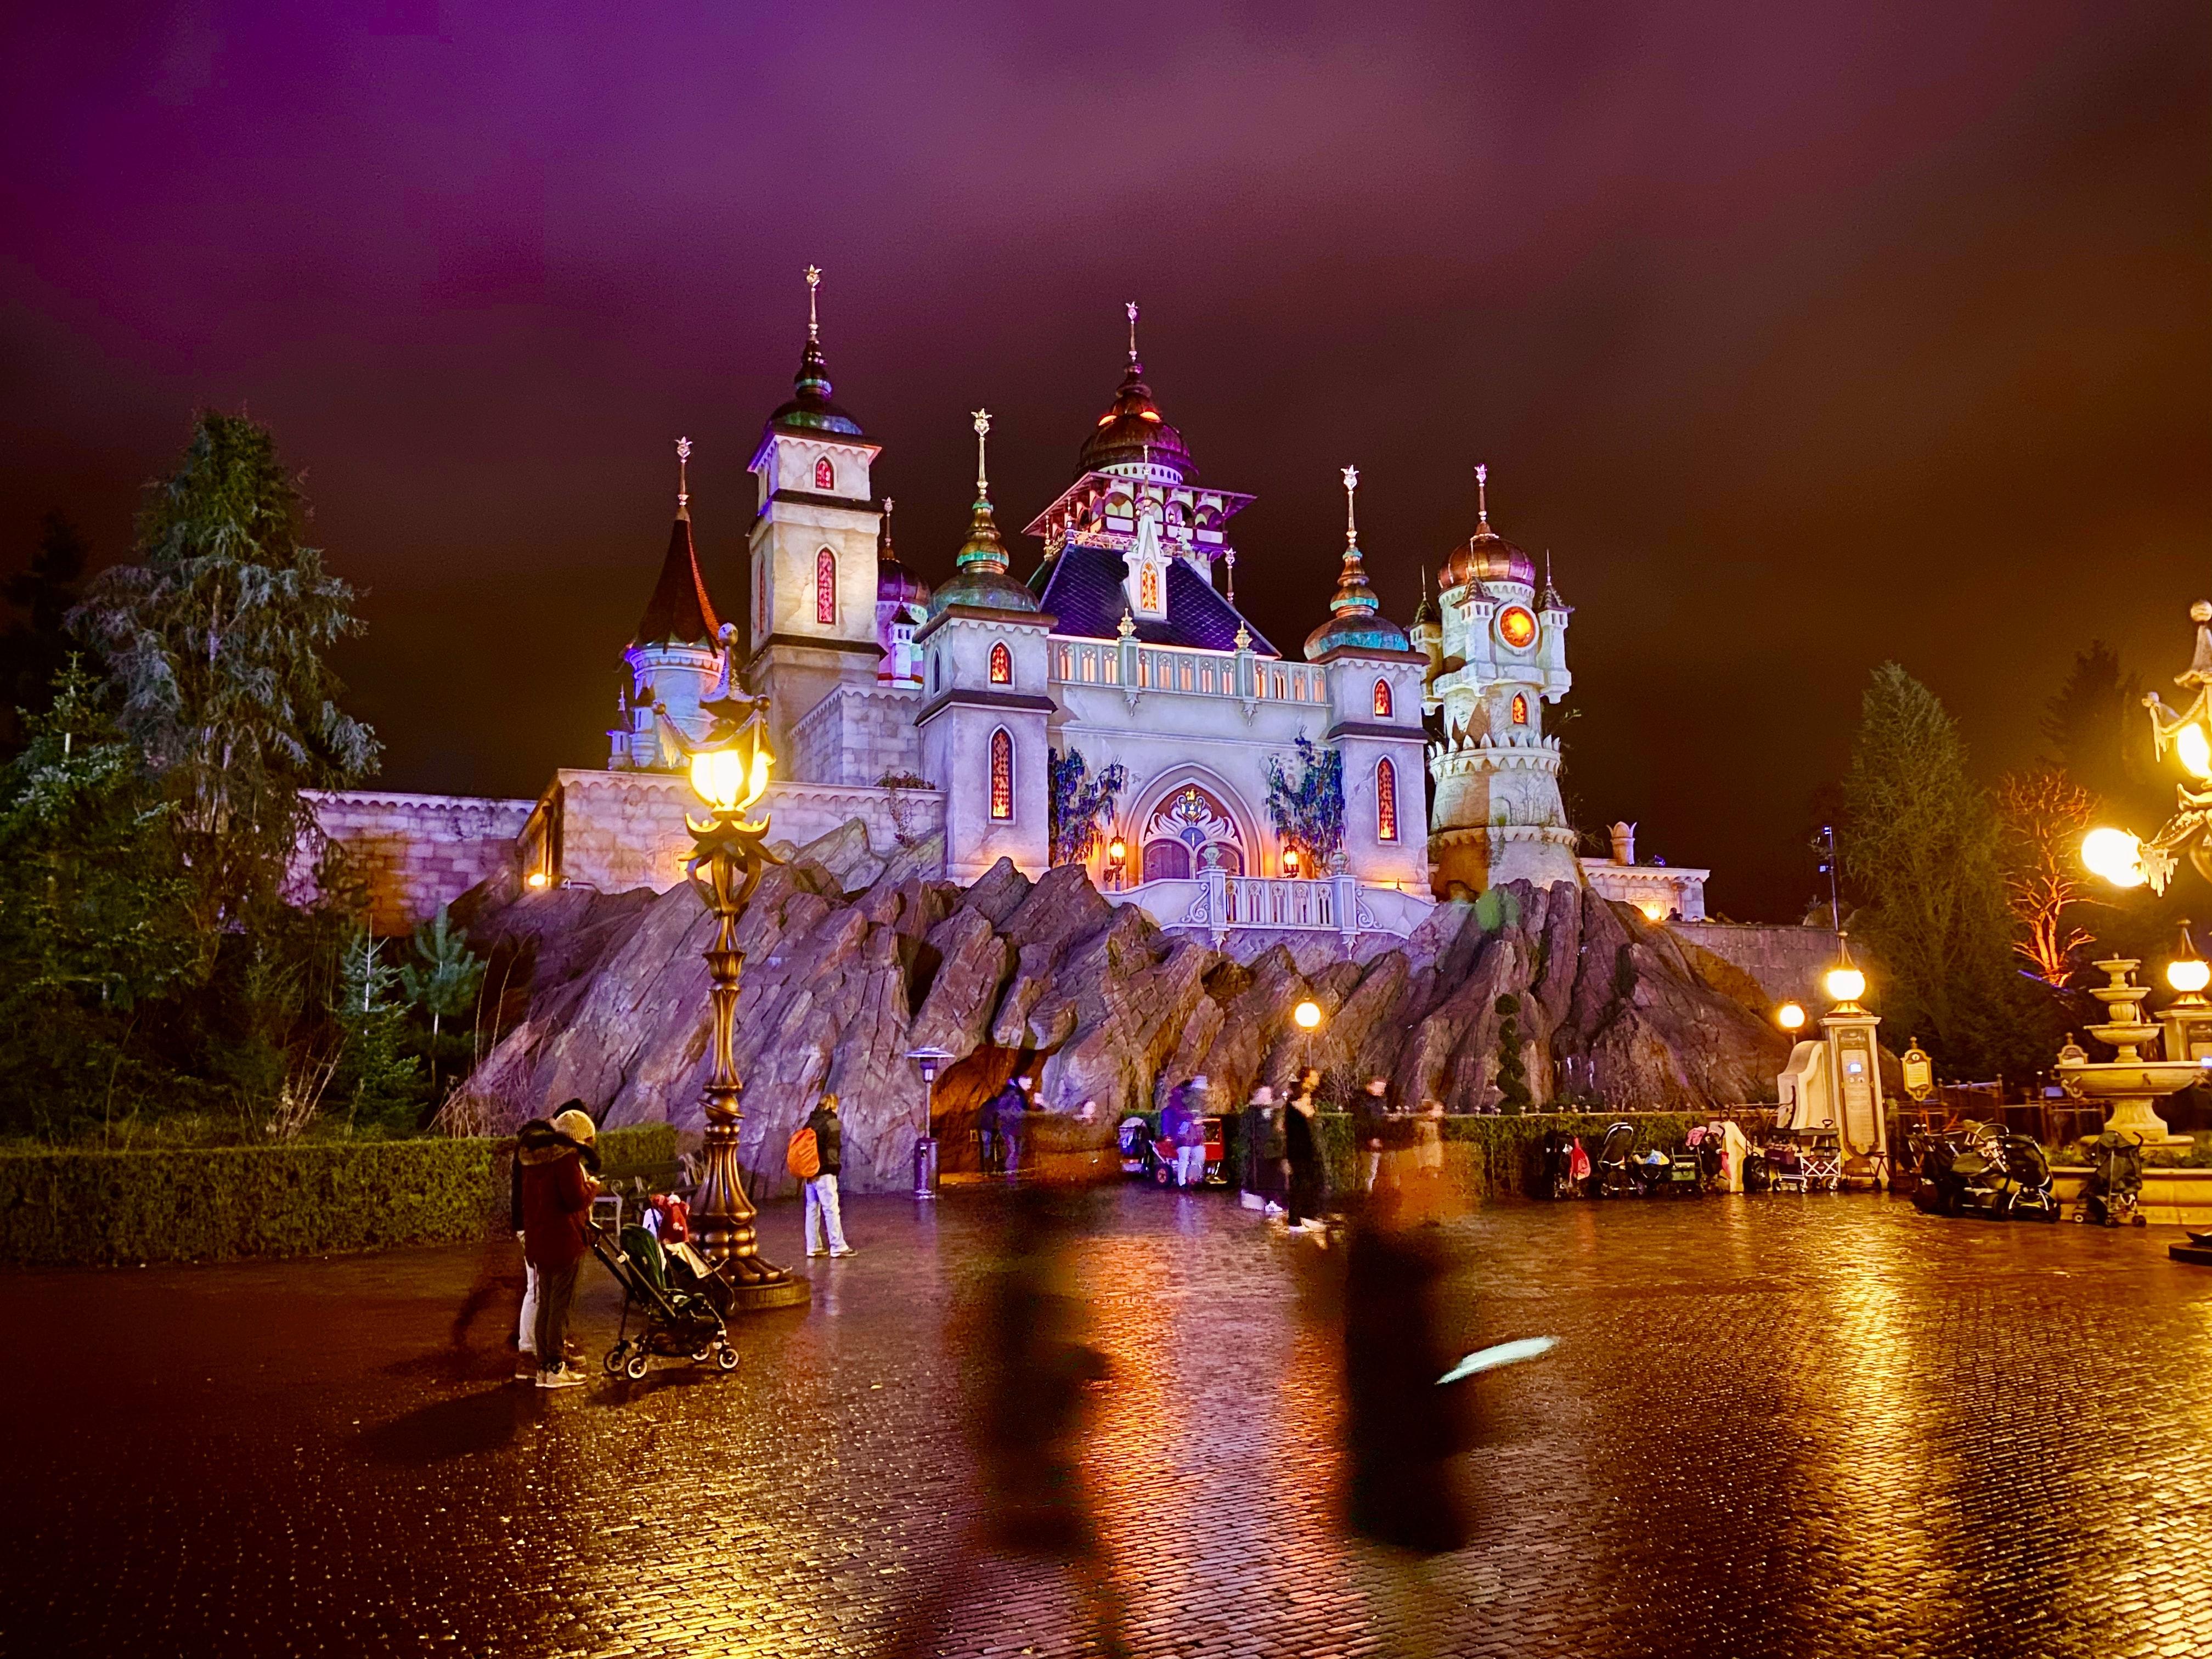 Enjoy the Efteling Theme Park